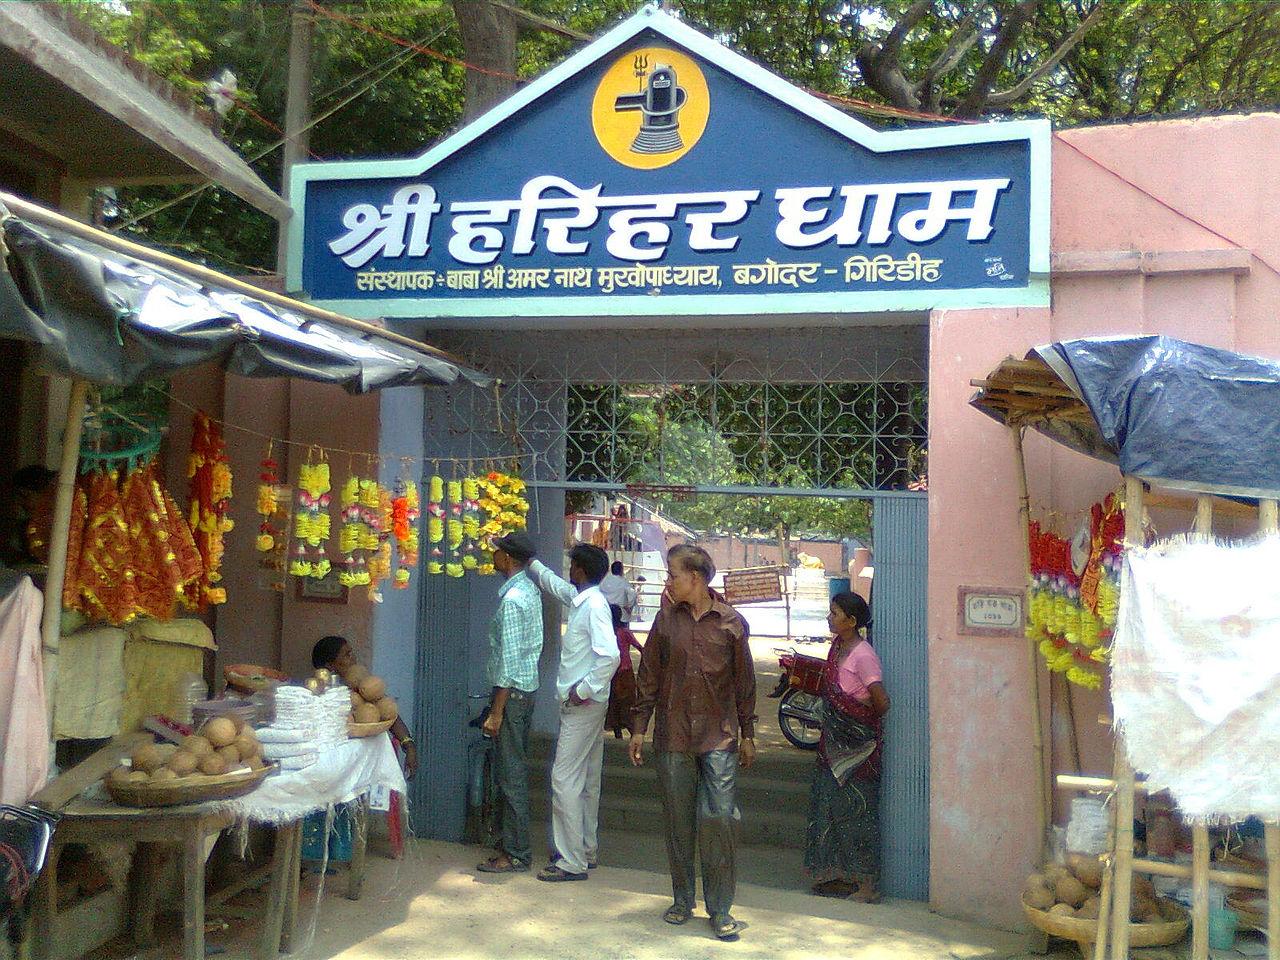 Top Sightseeing Spot in Giridih-Harihar Dham